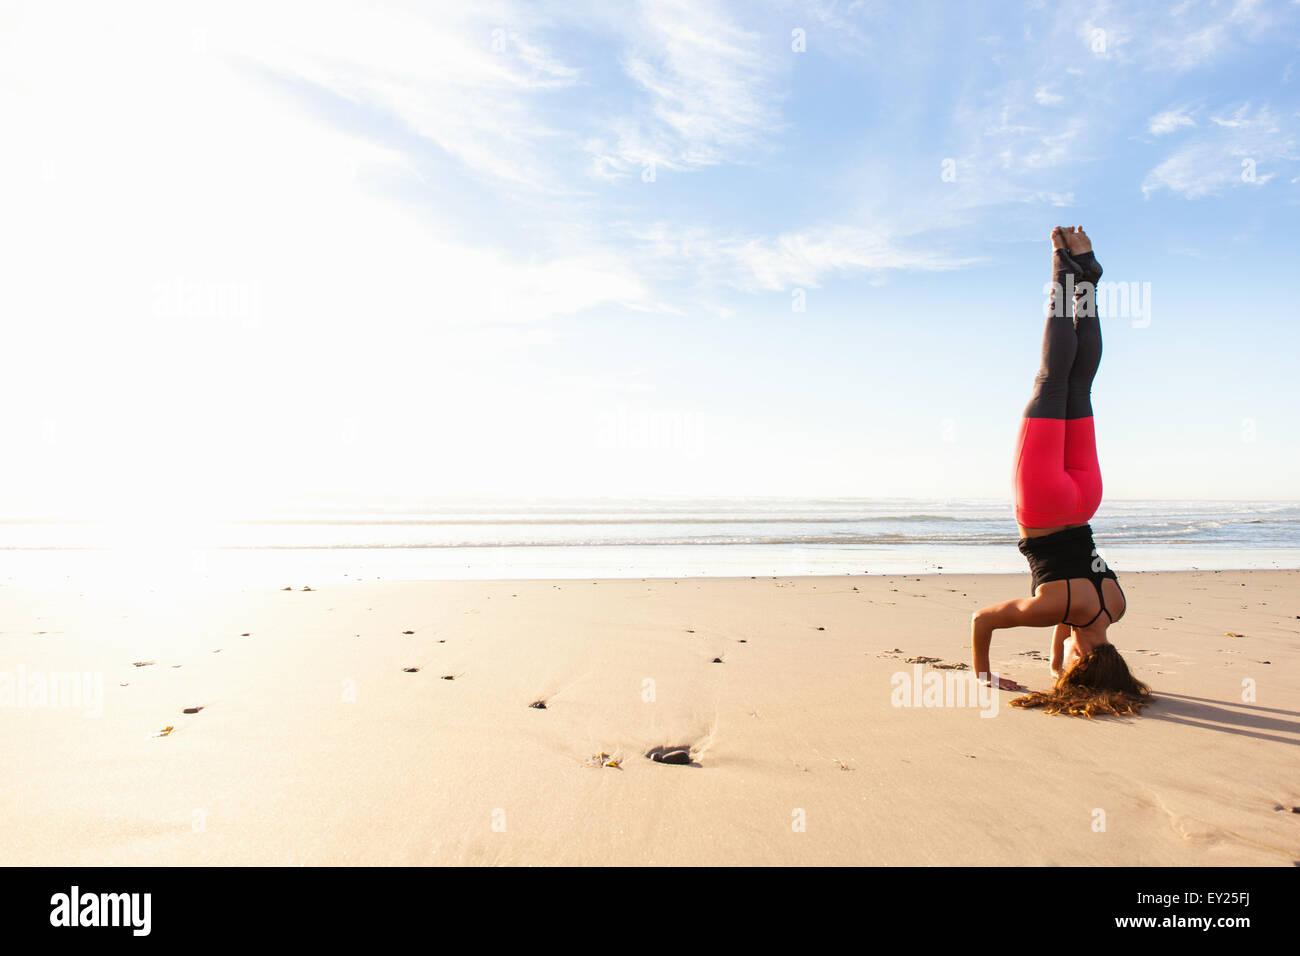 Woman in yoga pose on beach - Stock Image